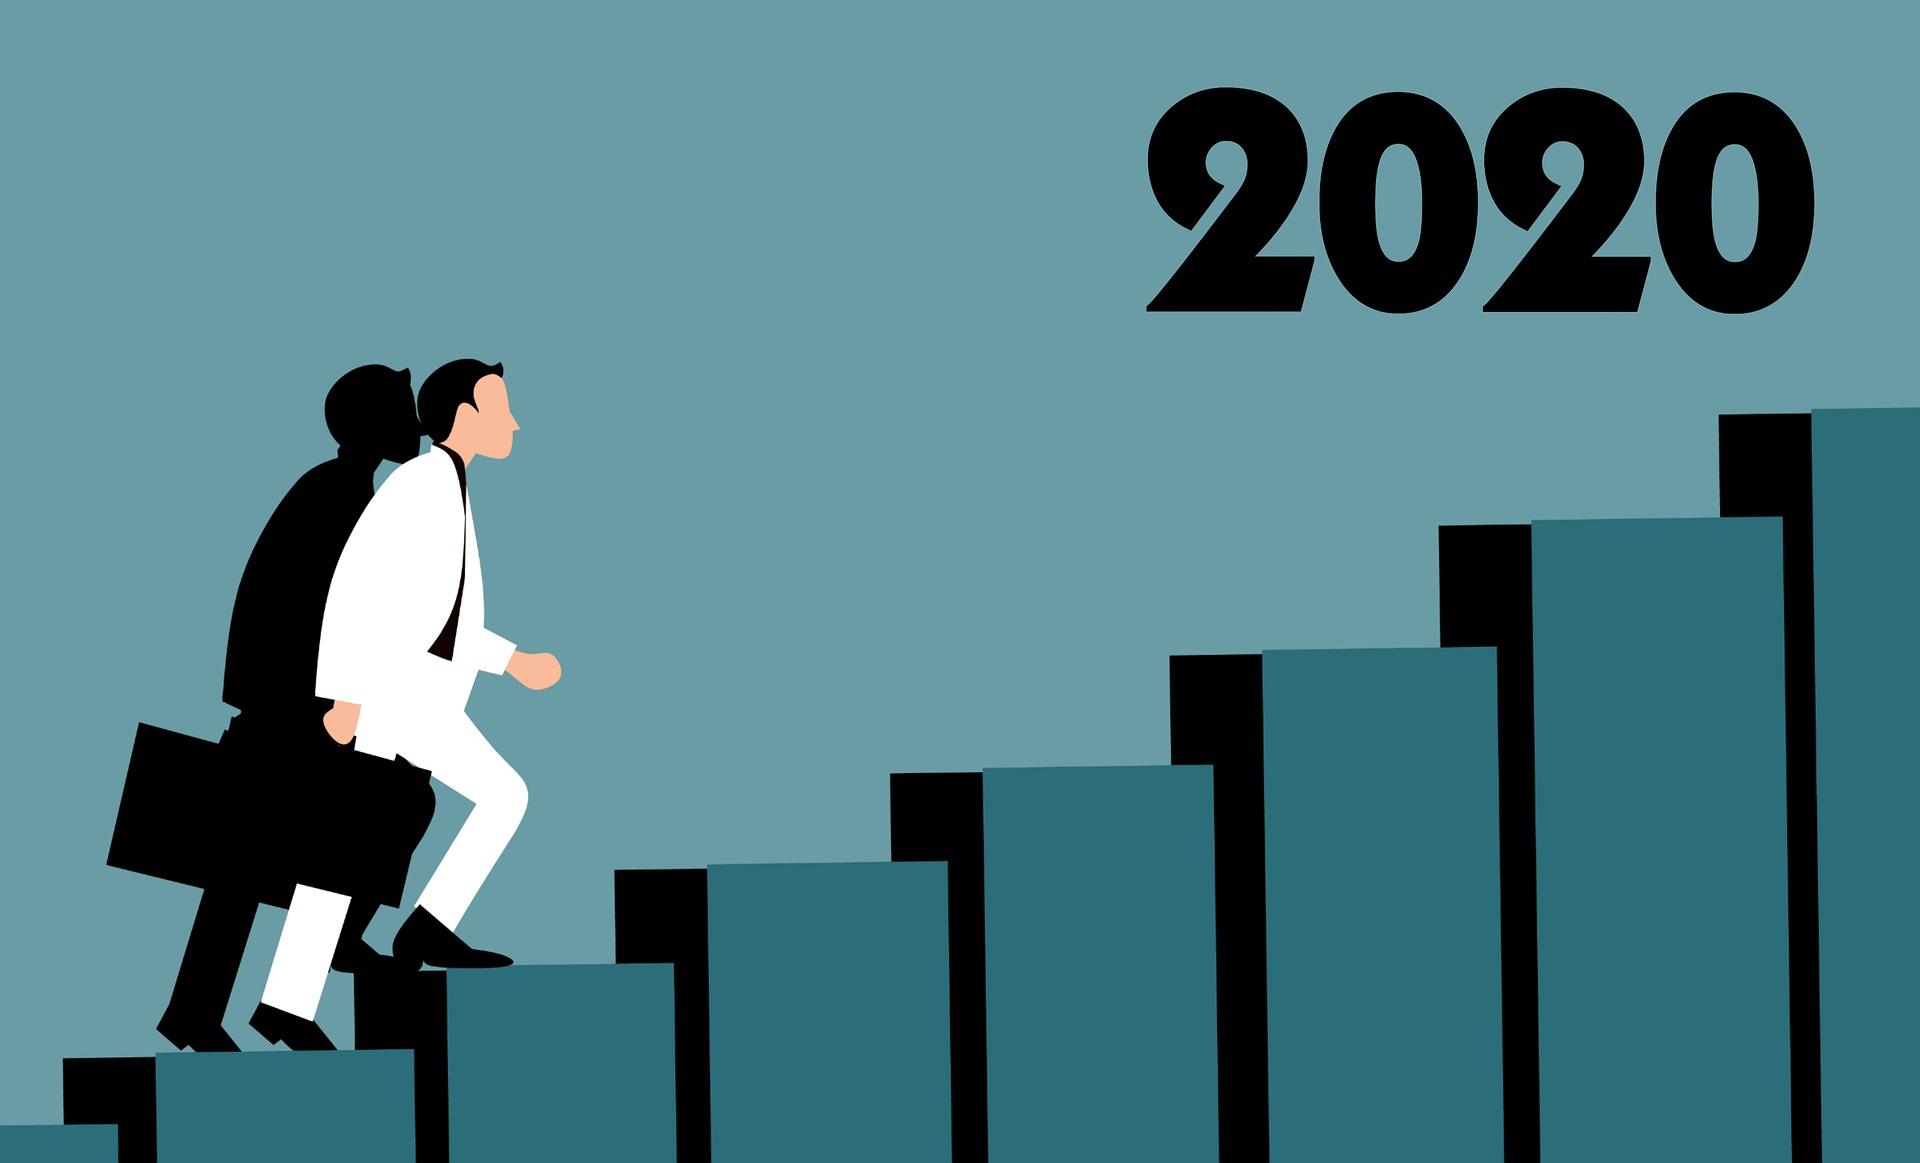 5 SEO tactics you should focus on in 2020